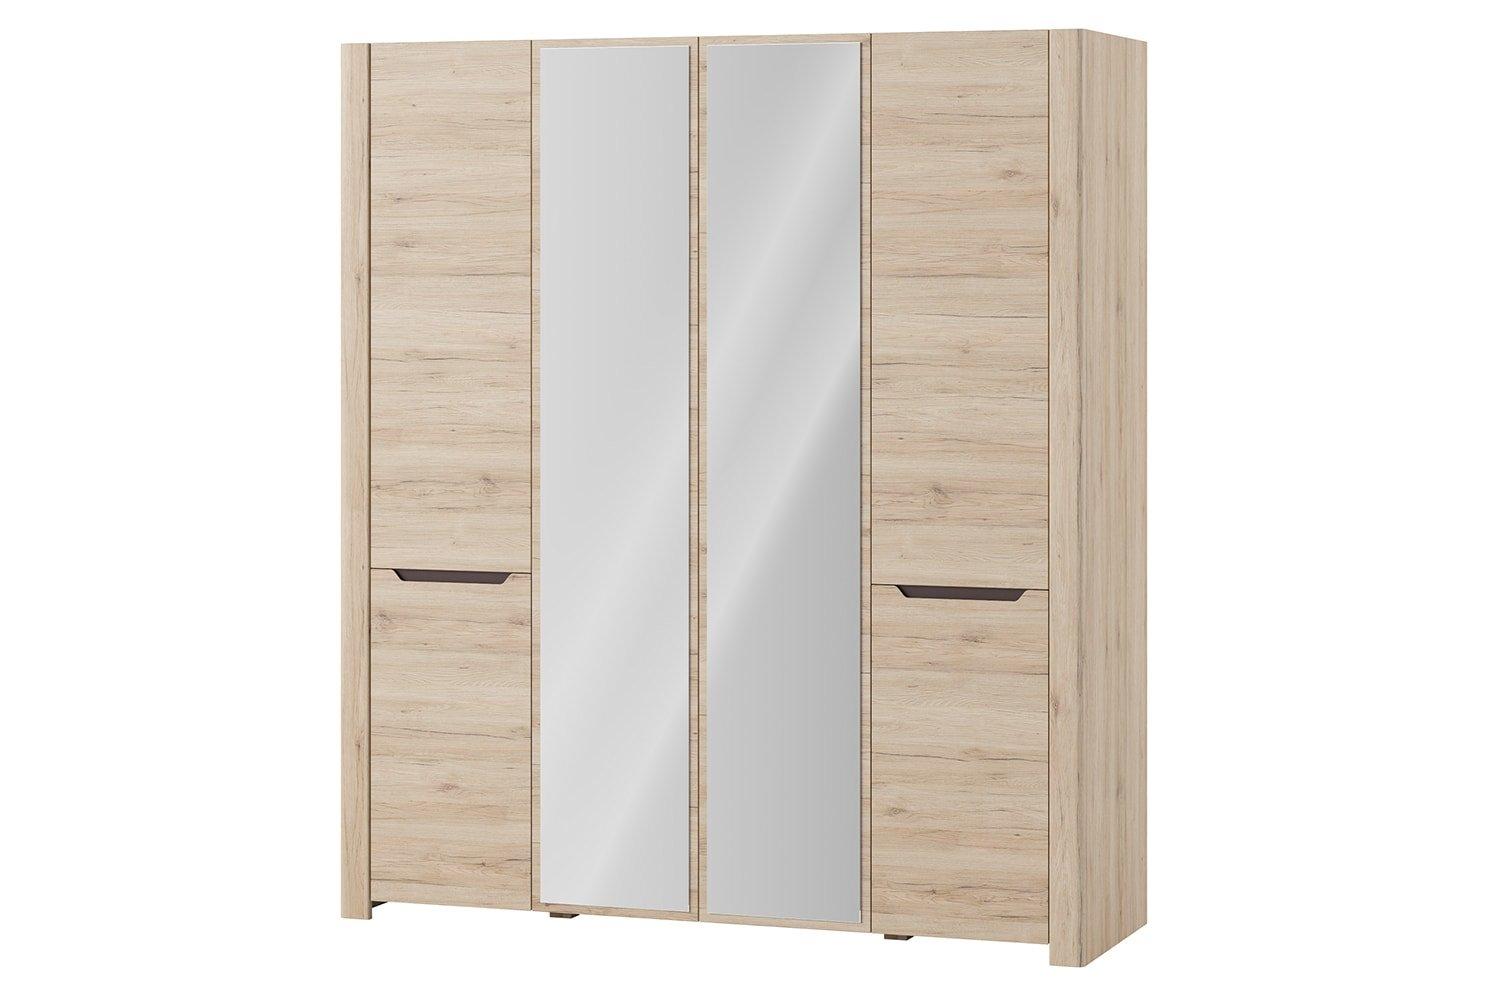 Dulap cu 4 usi si oglinda Desjo 07 l181xA58xH207 cm